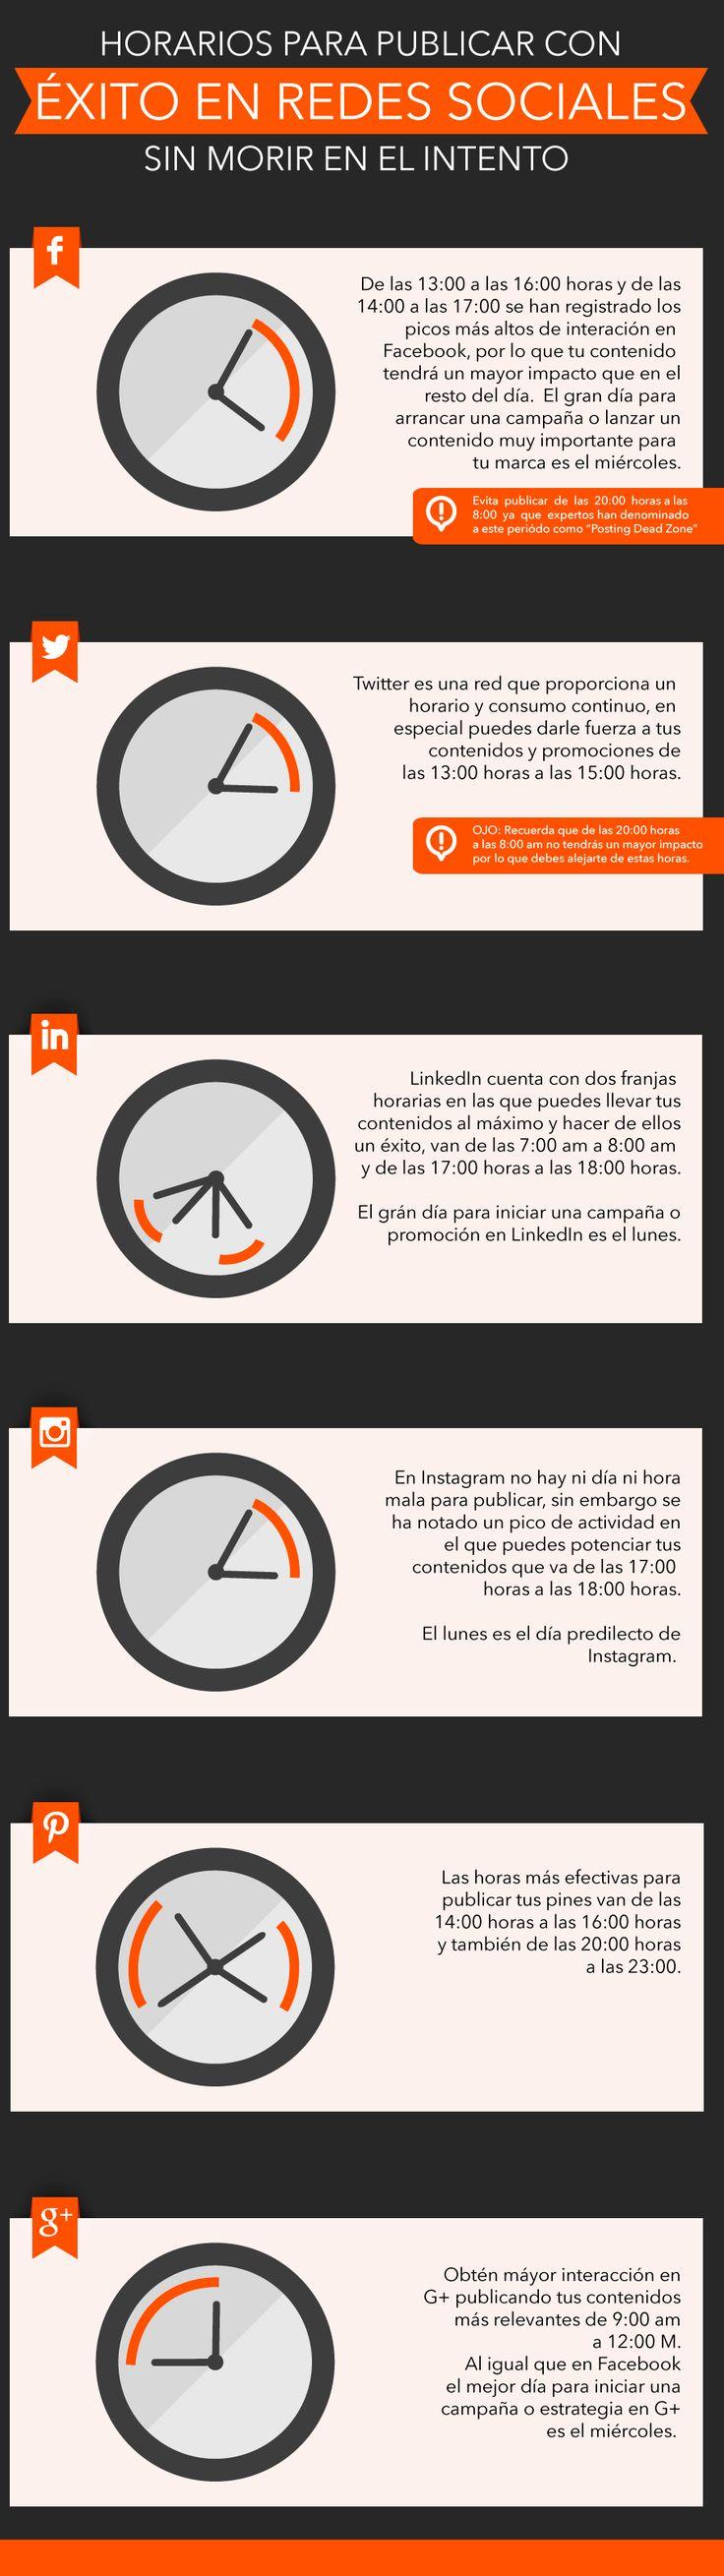 Horarios para publicar con éxito en redes sociales   Mundo Ejecutivo